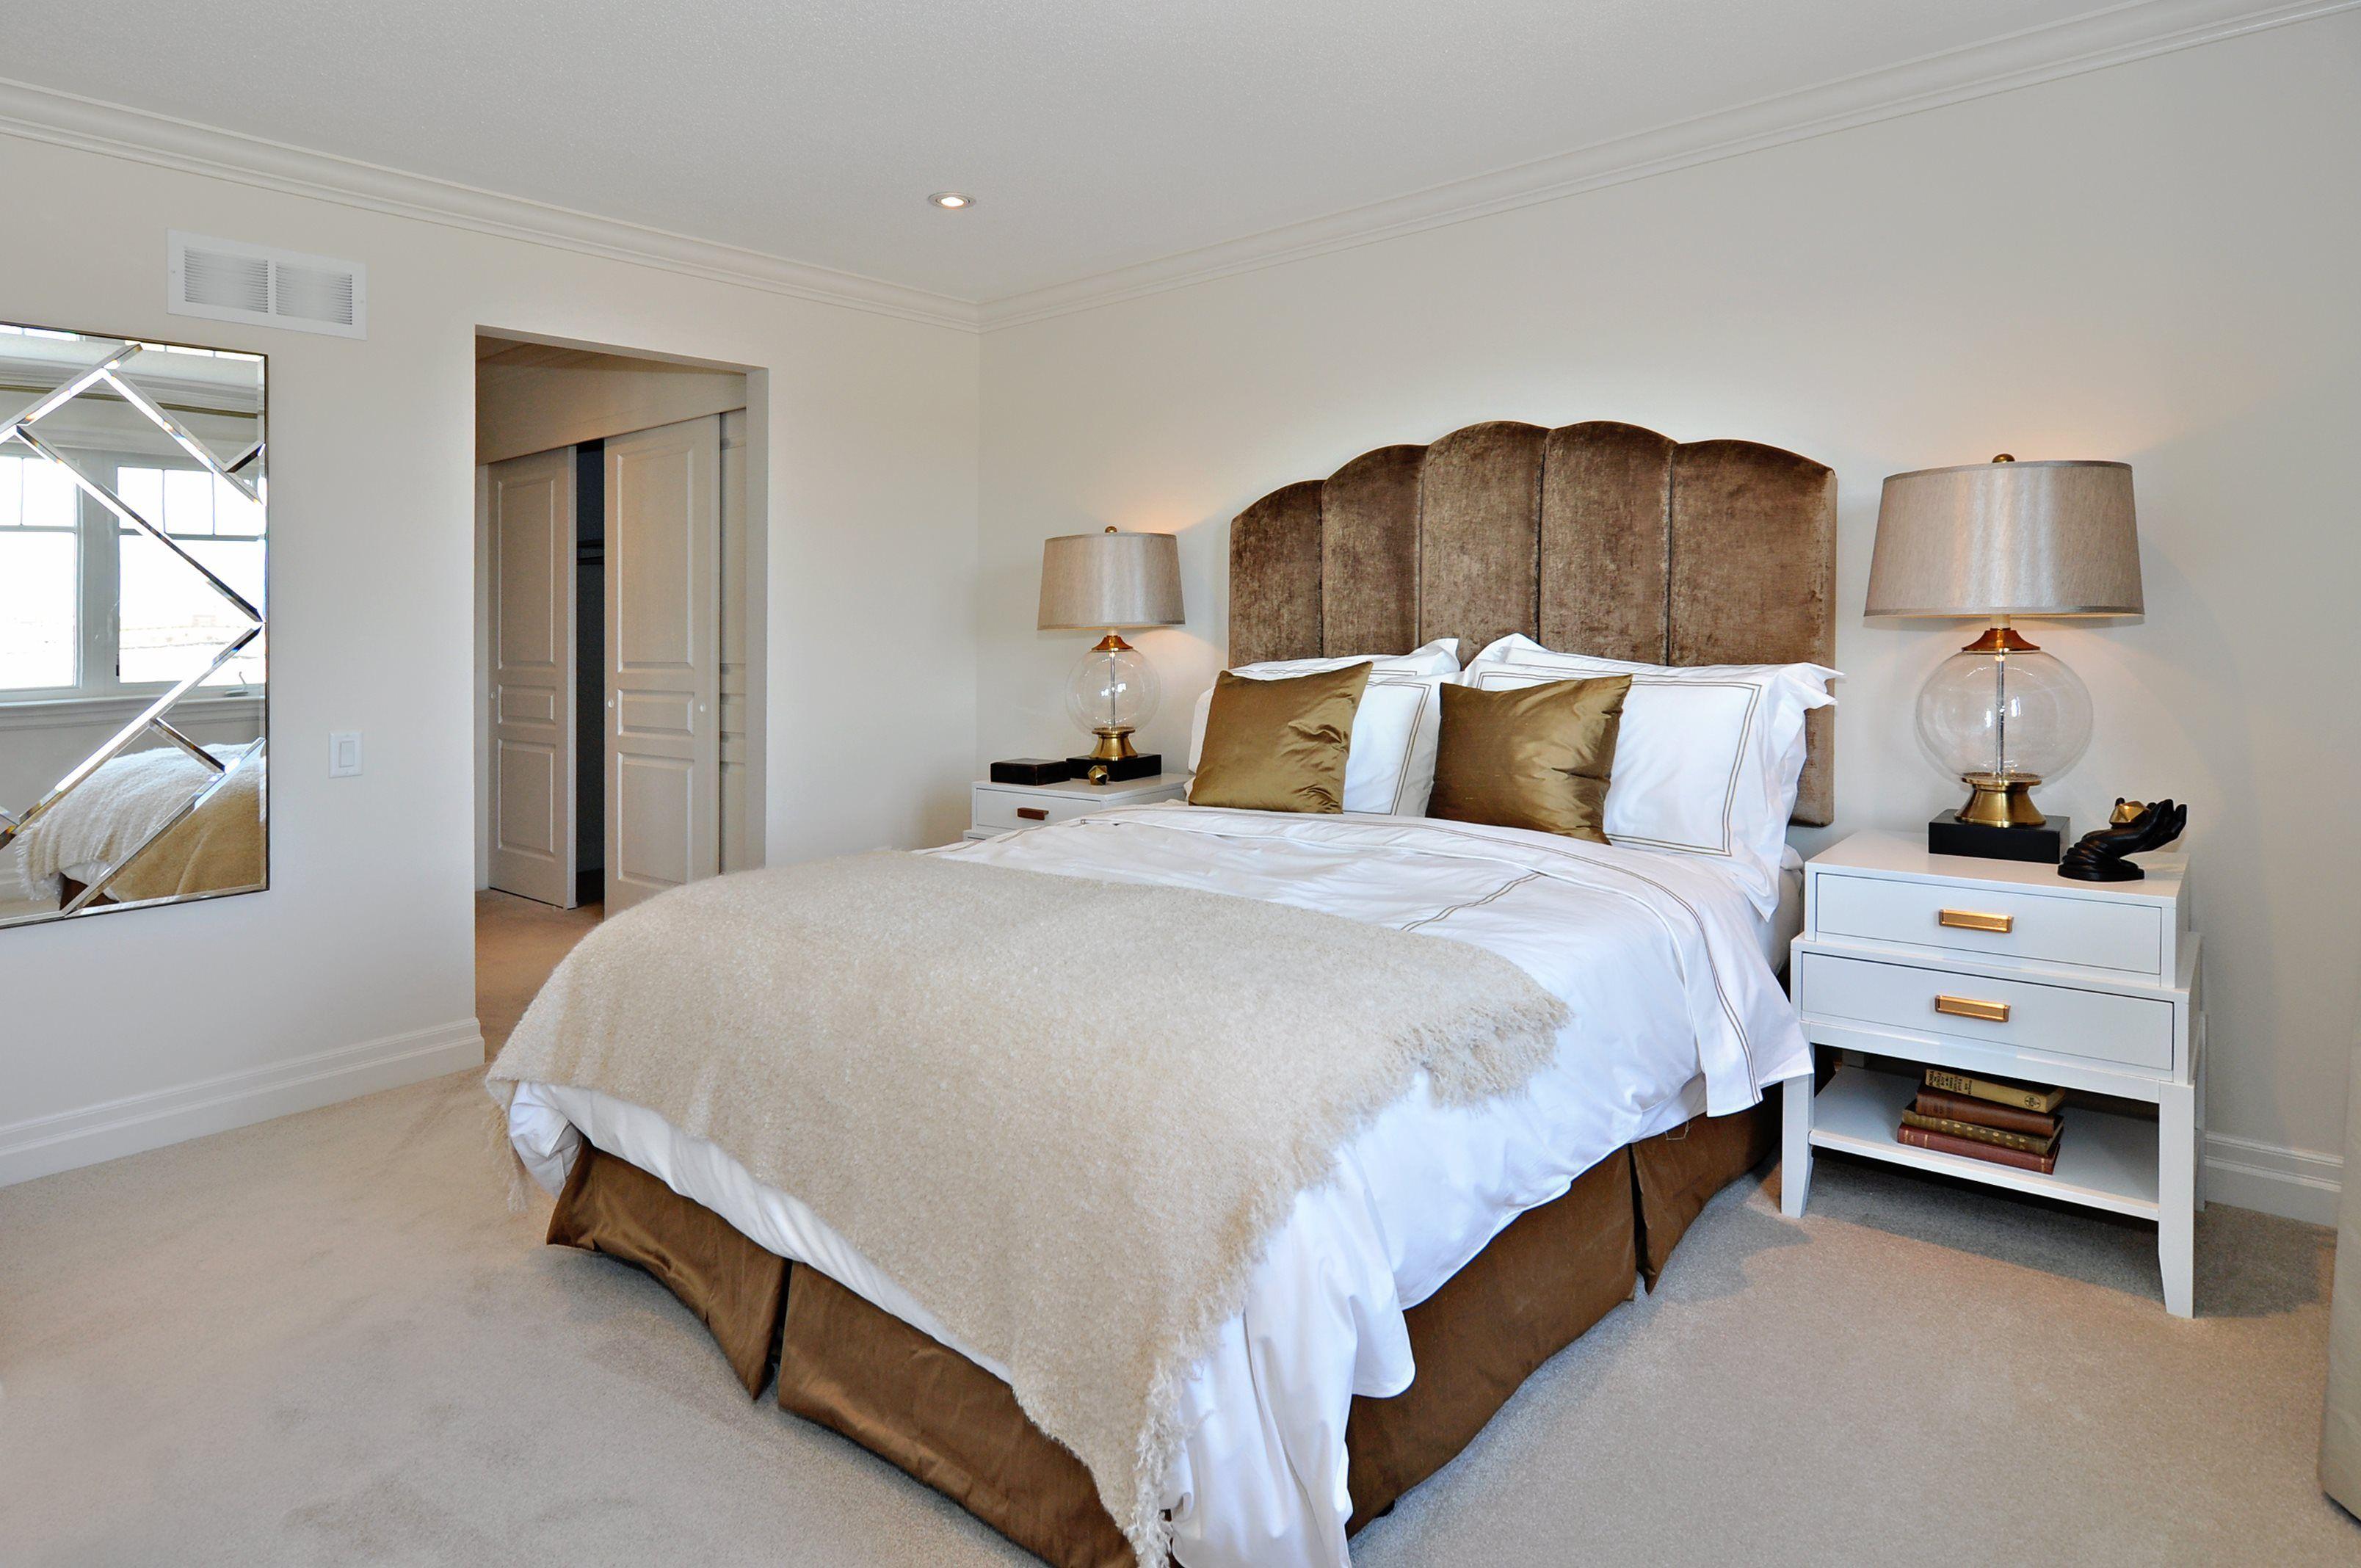 blackstone homes model bedroom monarch ottawa kanata bedroom - Blackstone Home Design